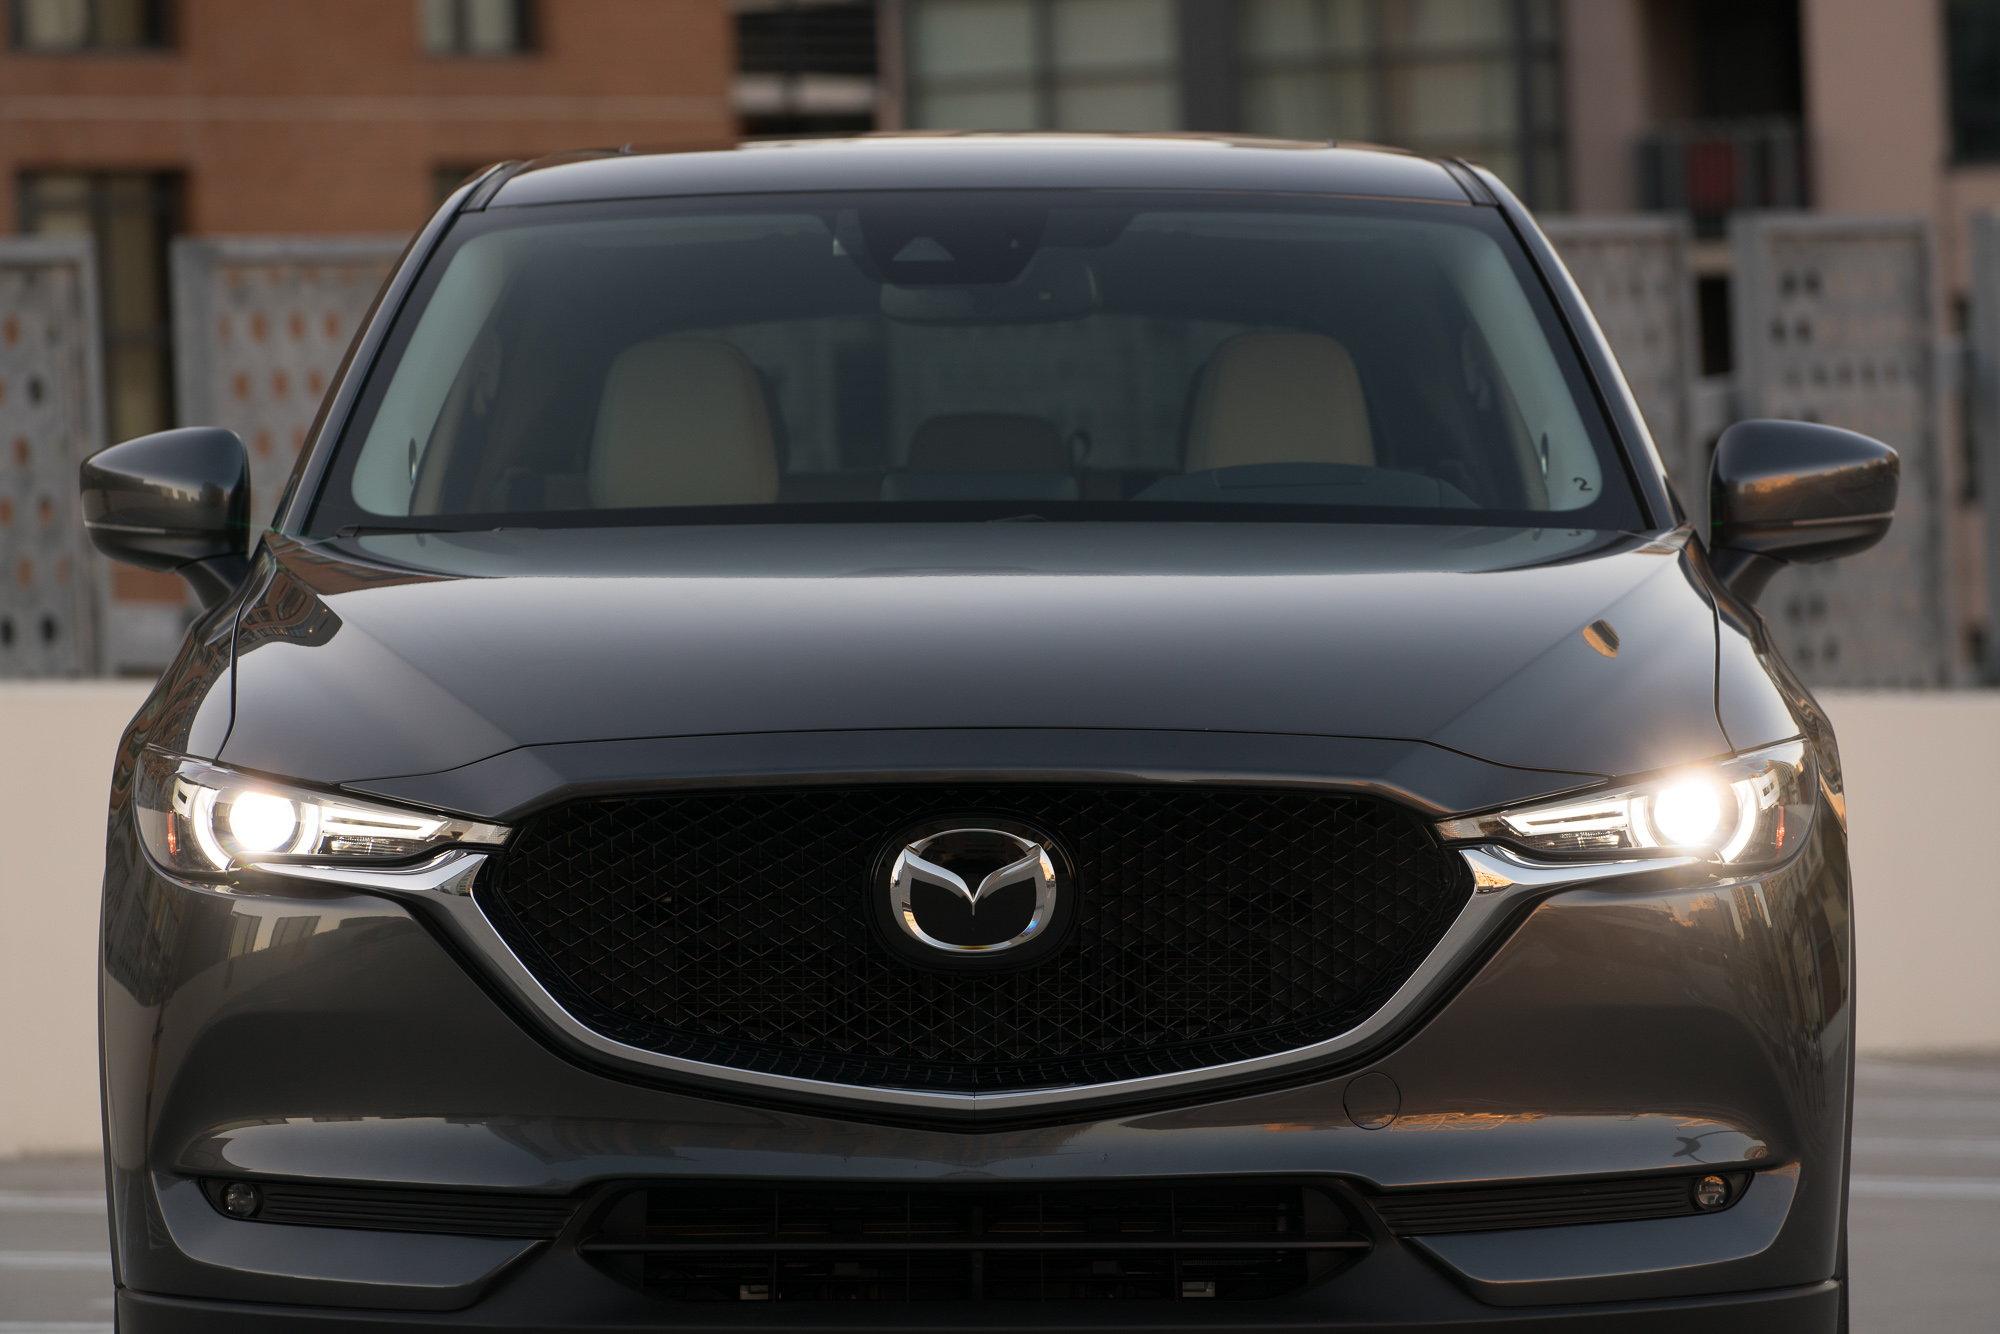 Price Of Mazda 5 >> 2018 Mazda CX-5: Preview, Pricing, Release Date